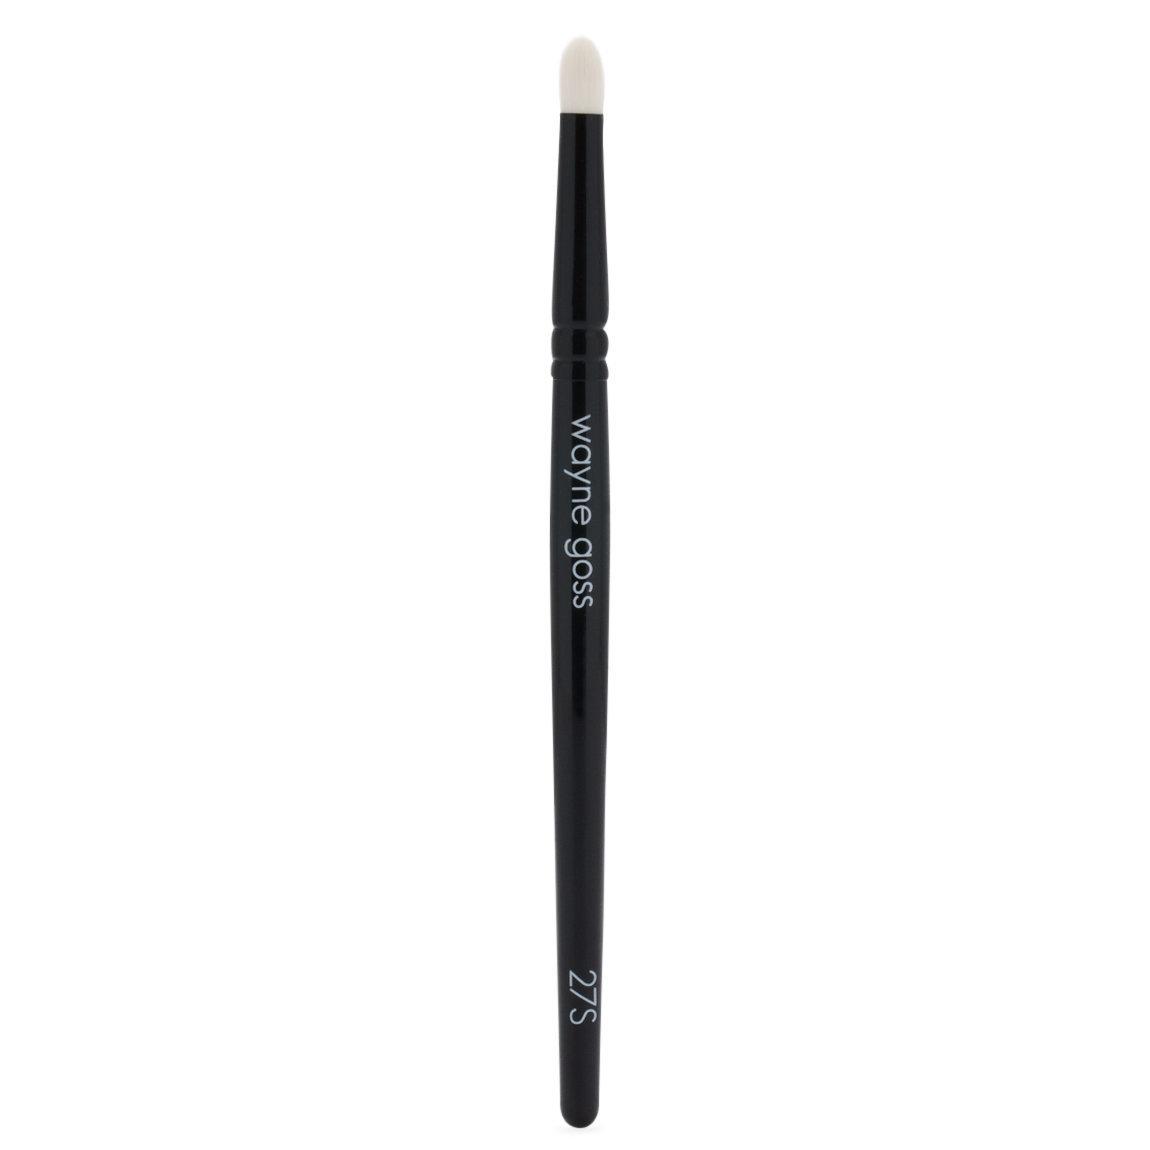 Wayne Goss Brush 27S Pencil Brush alternative view 1 - product swatch.